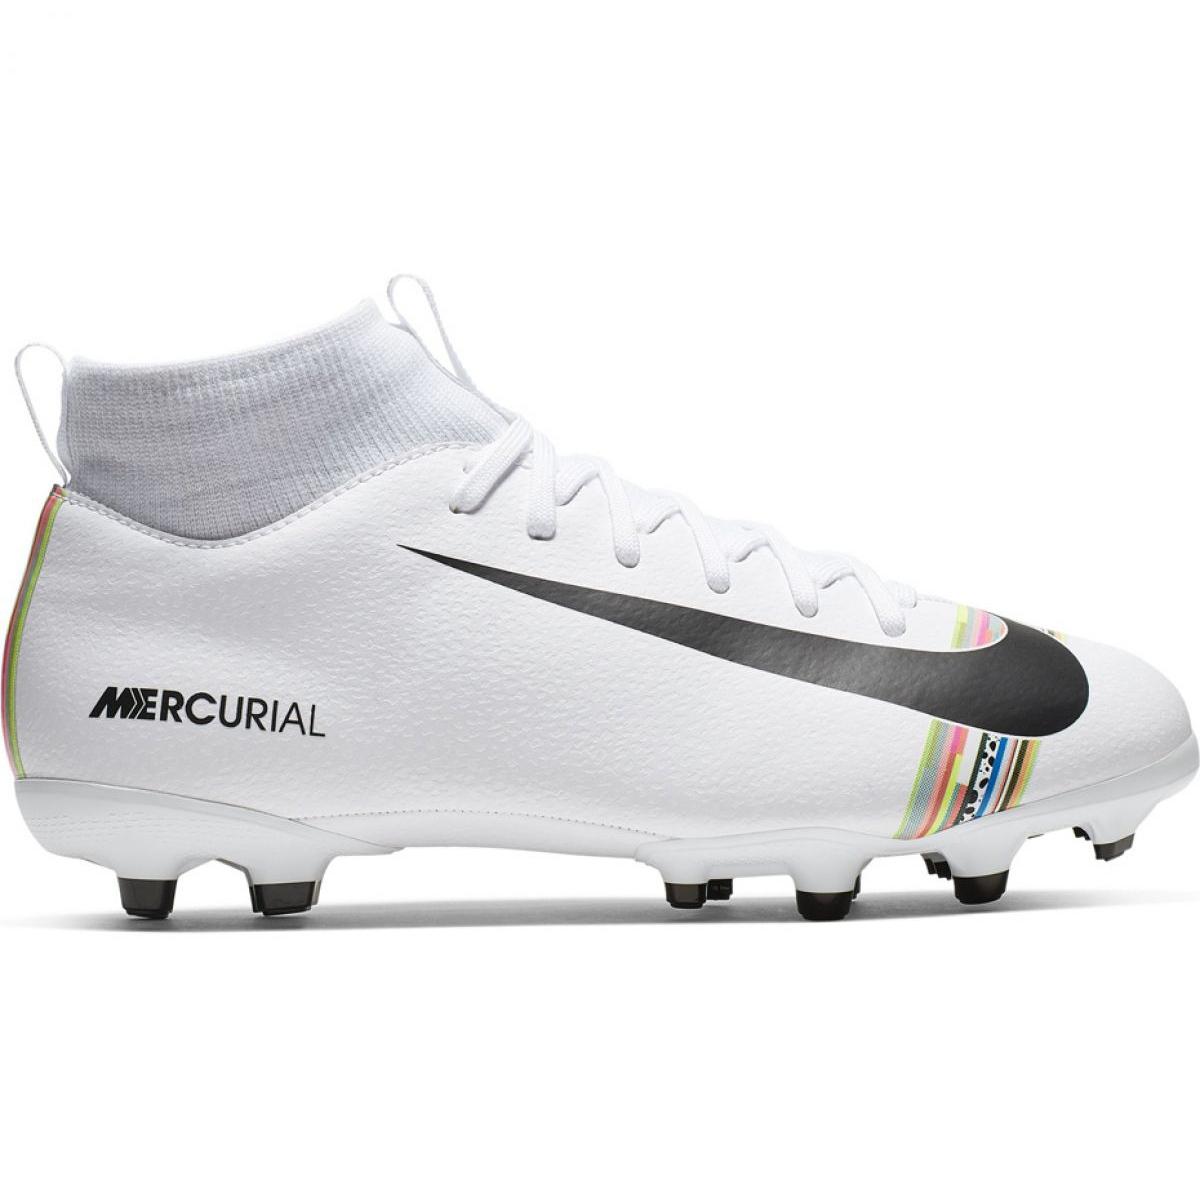 low priced 321c1 10780 Football shoes Nike Mercurial Superfly 6 Academy Mg Jr AJ3111-109